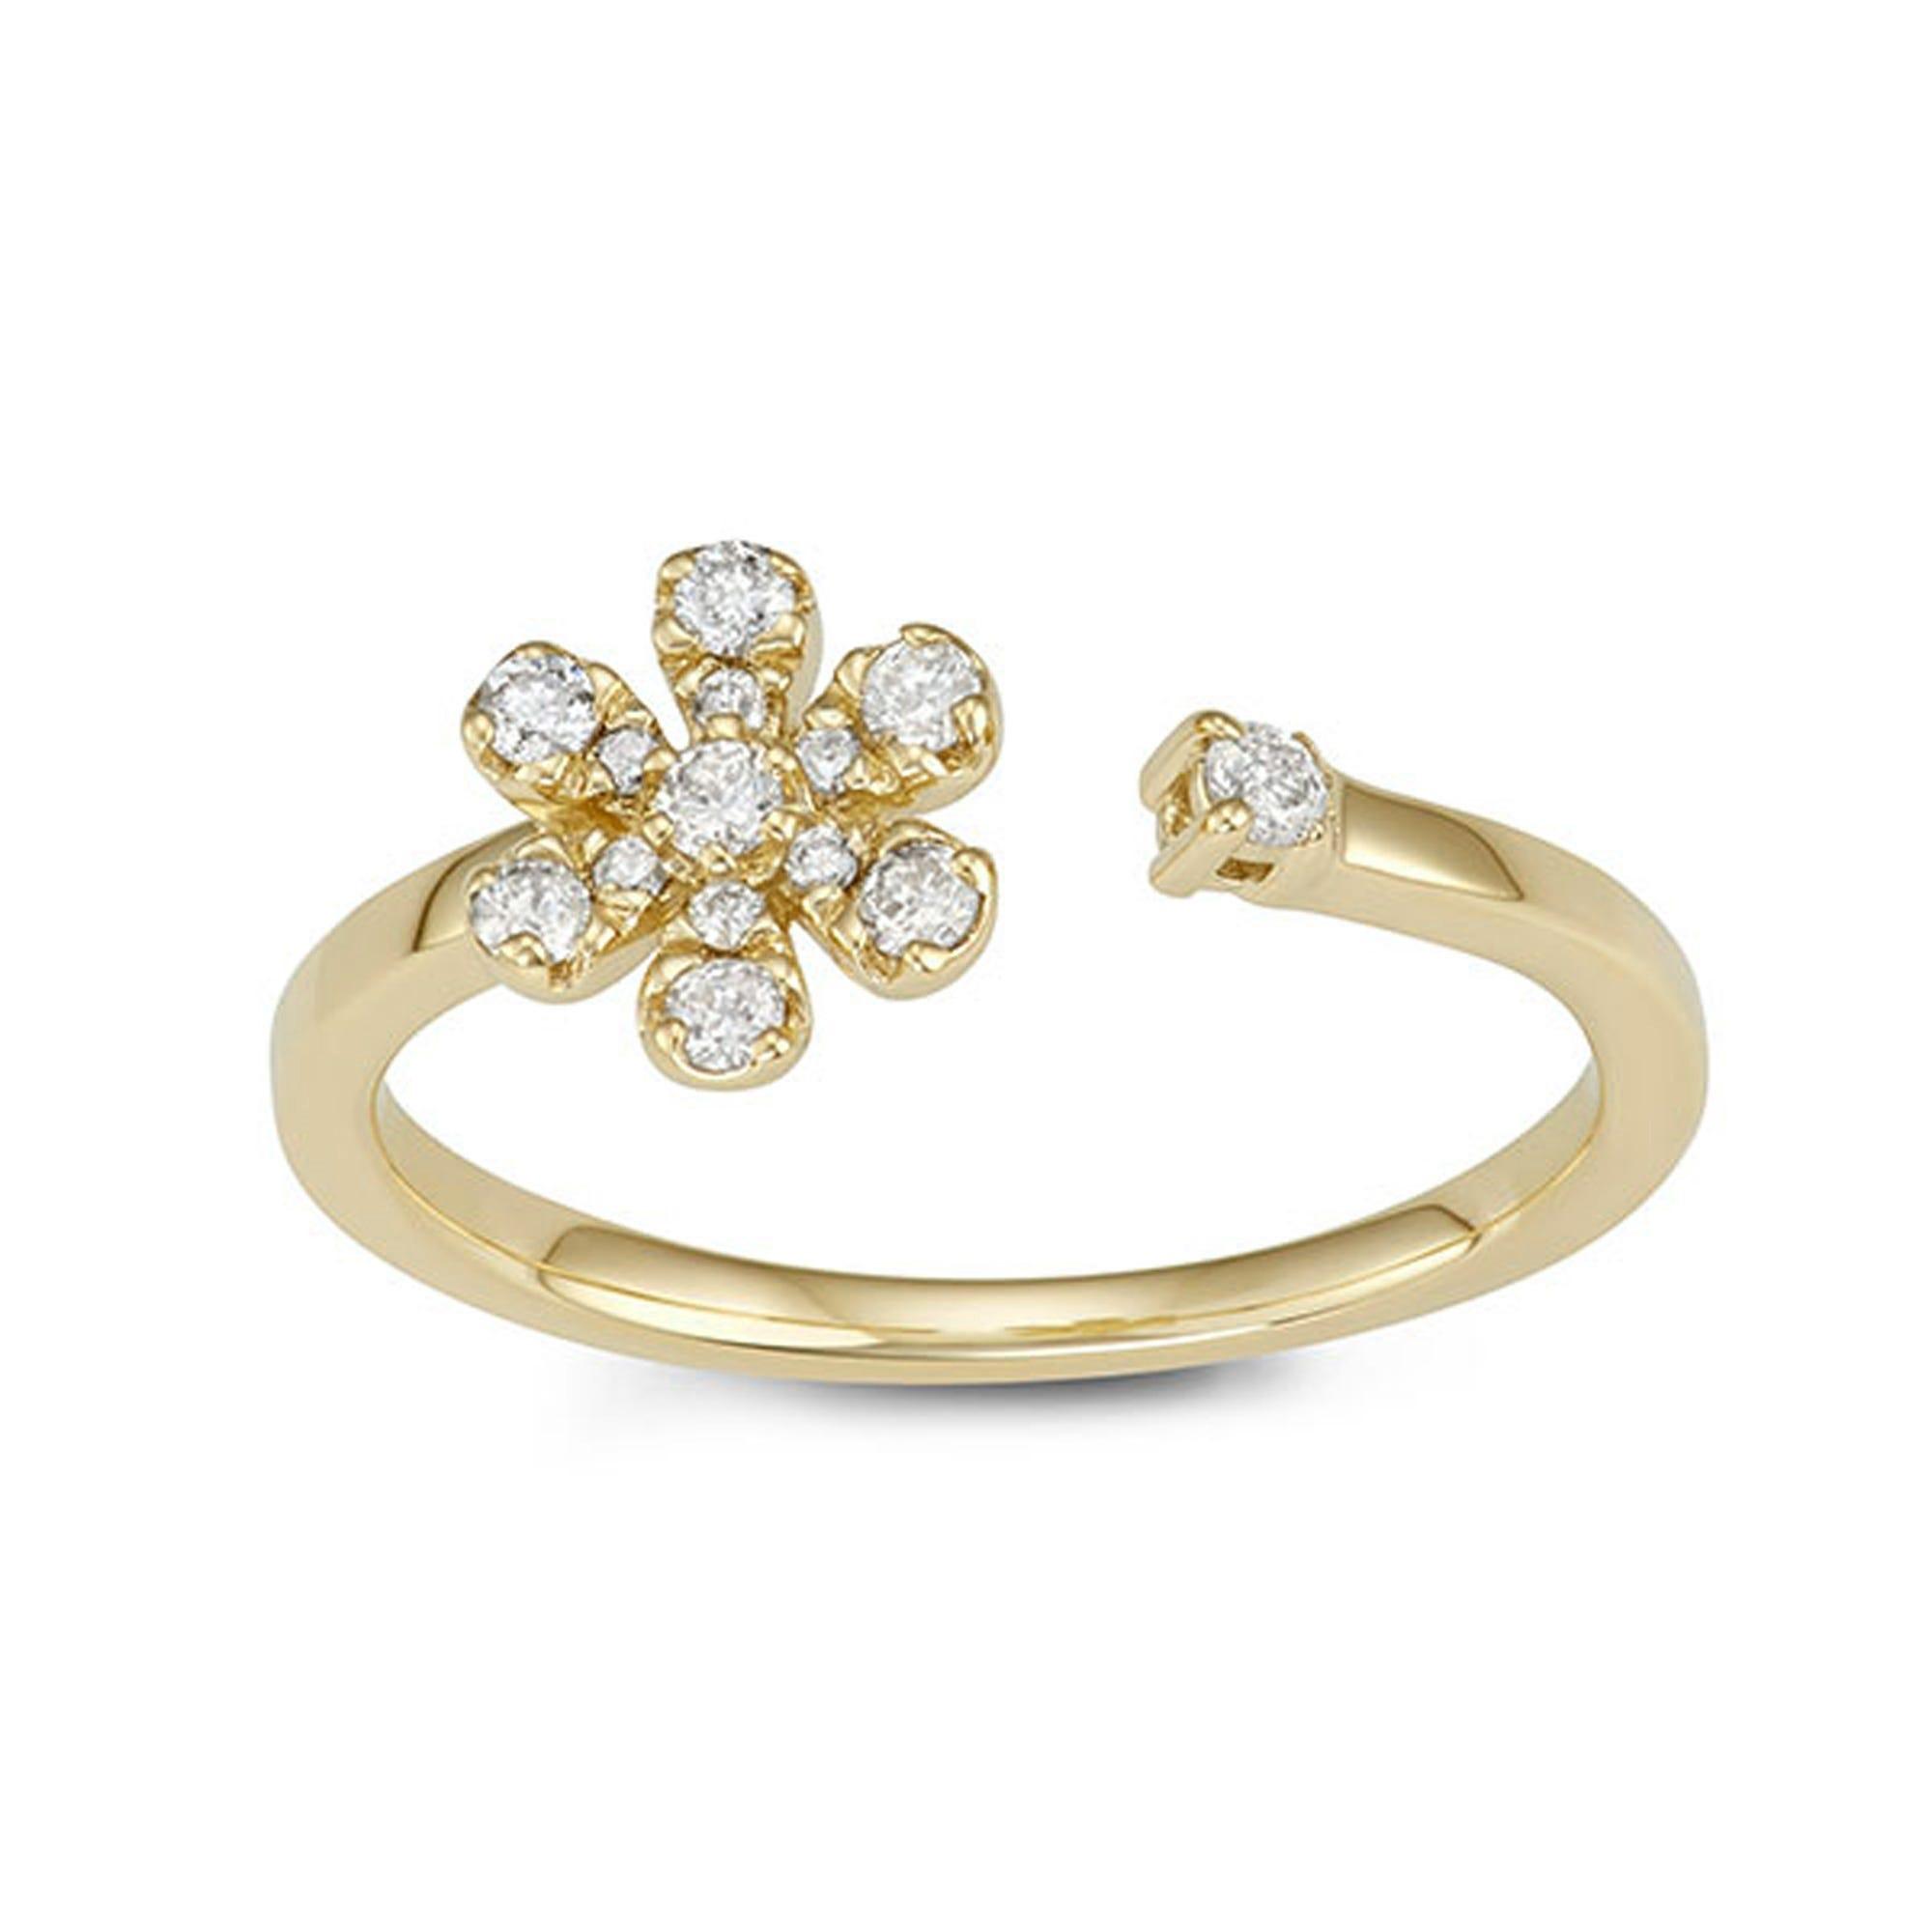 Open-Wrap Daisy Diamond Ring in 14k Yellow Gold